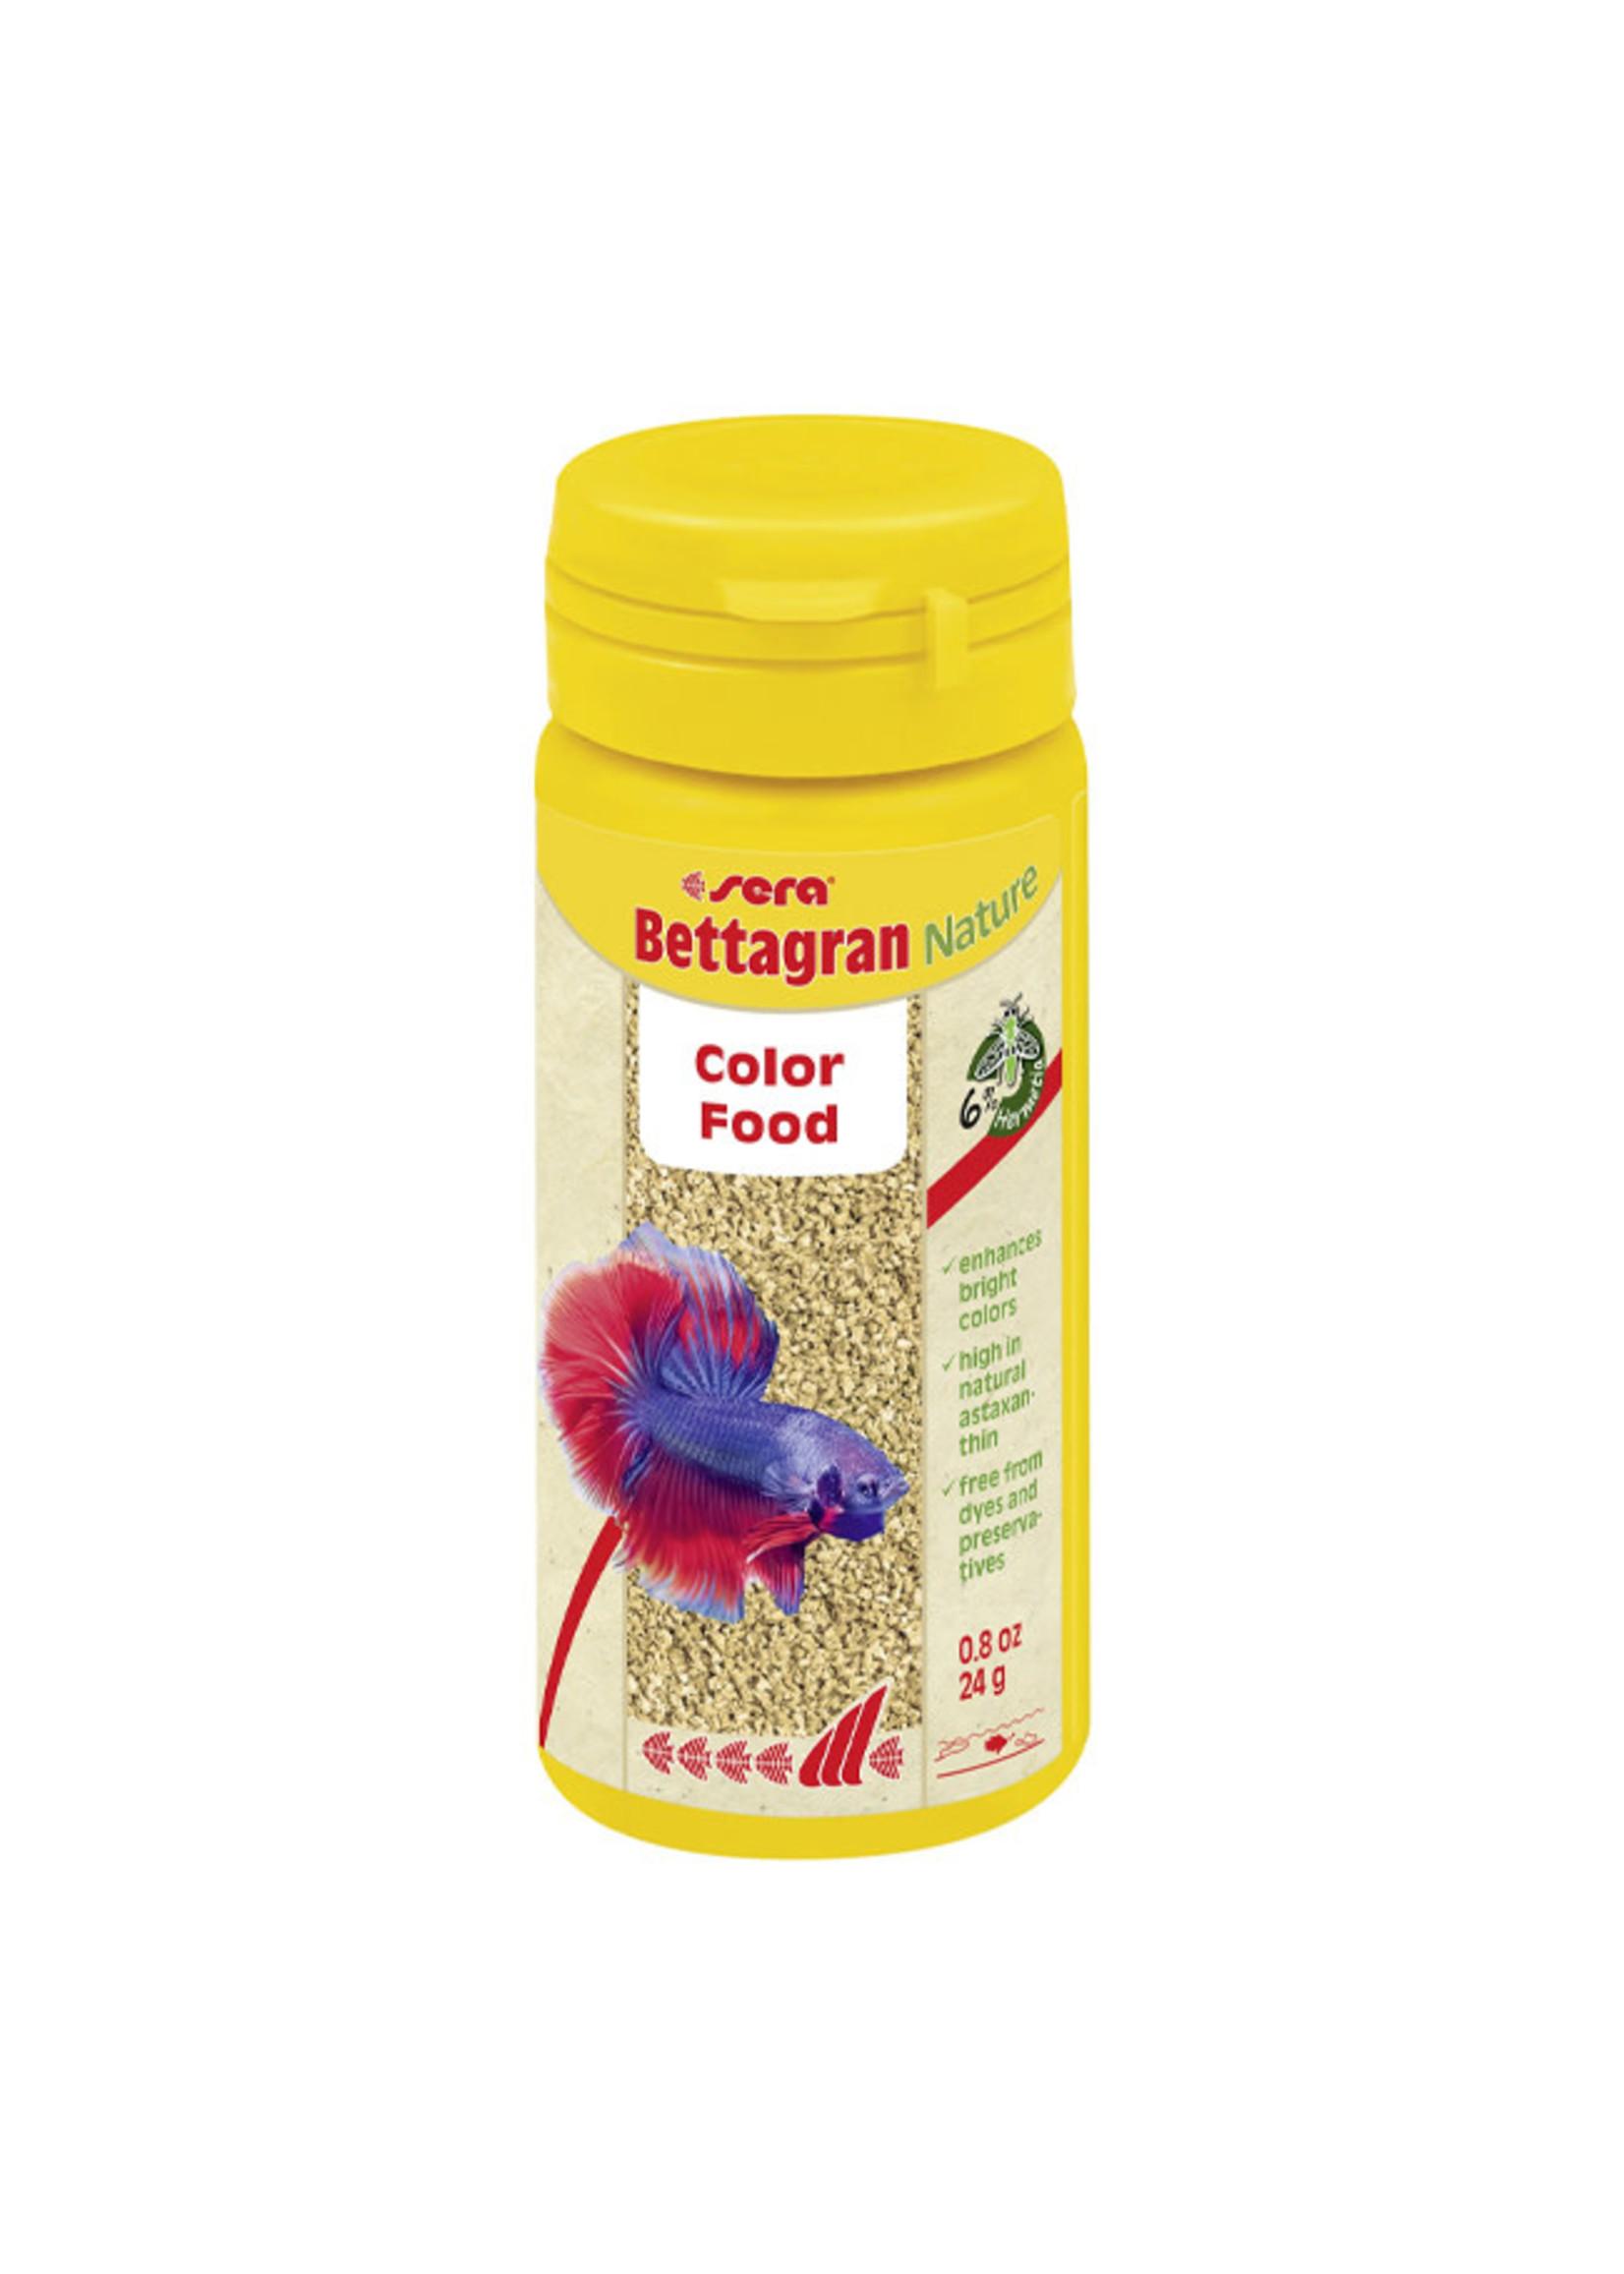 sera sera Bettagran Nature Color Food 24g / .80oz